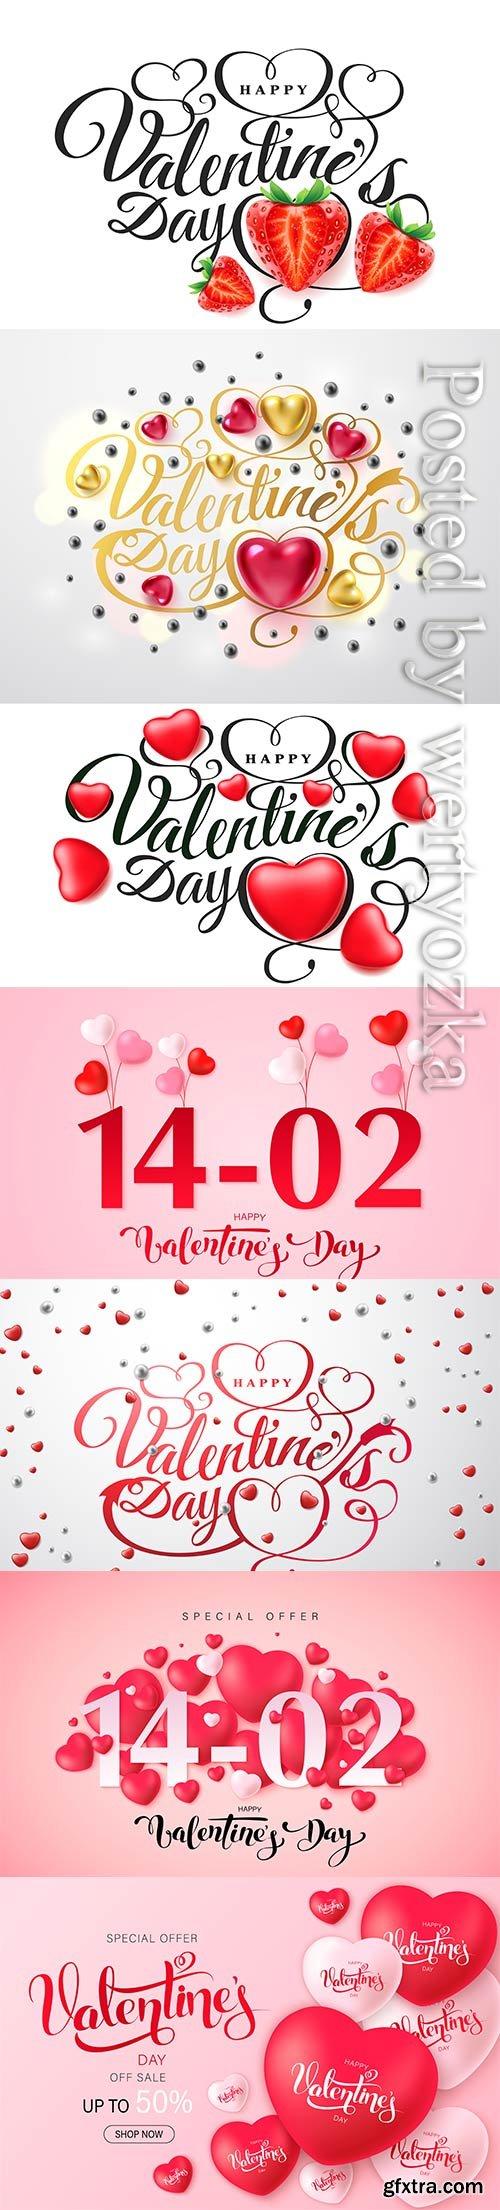 Happy valentine's day vector greeting card design